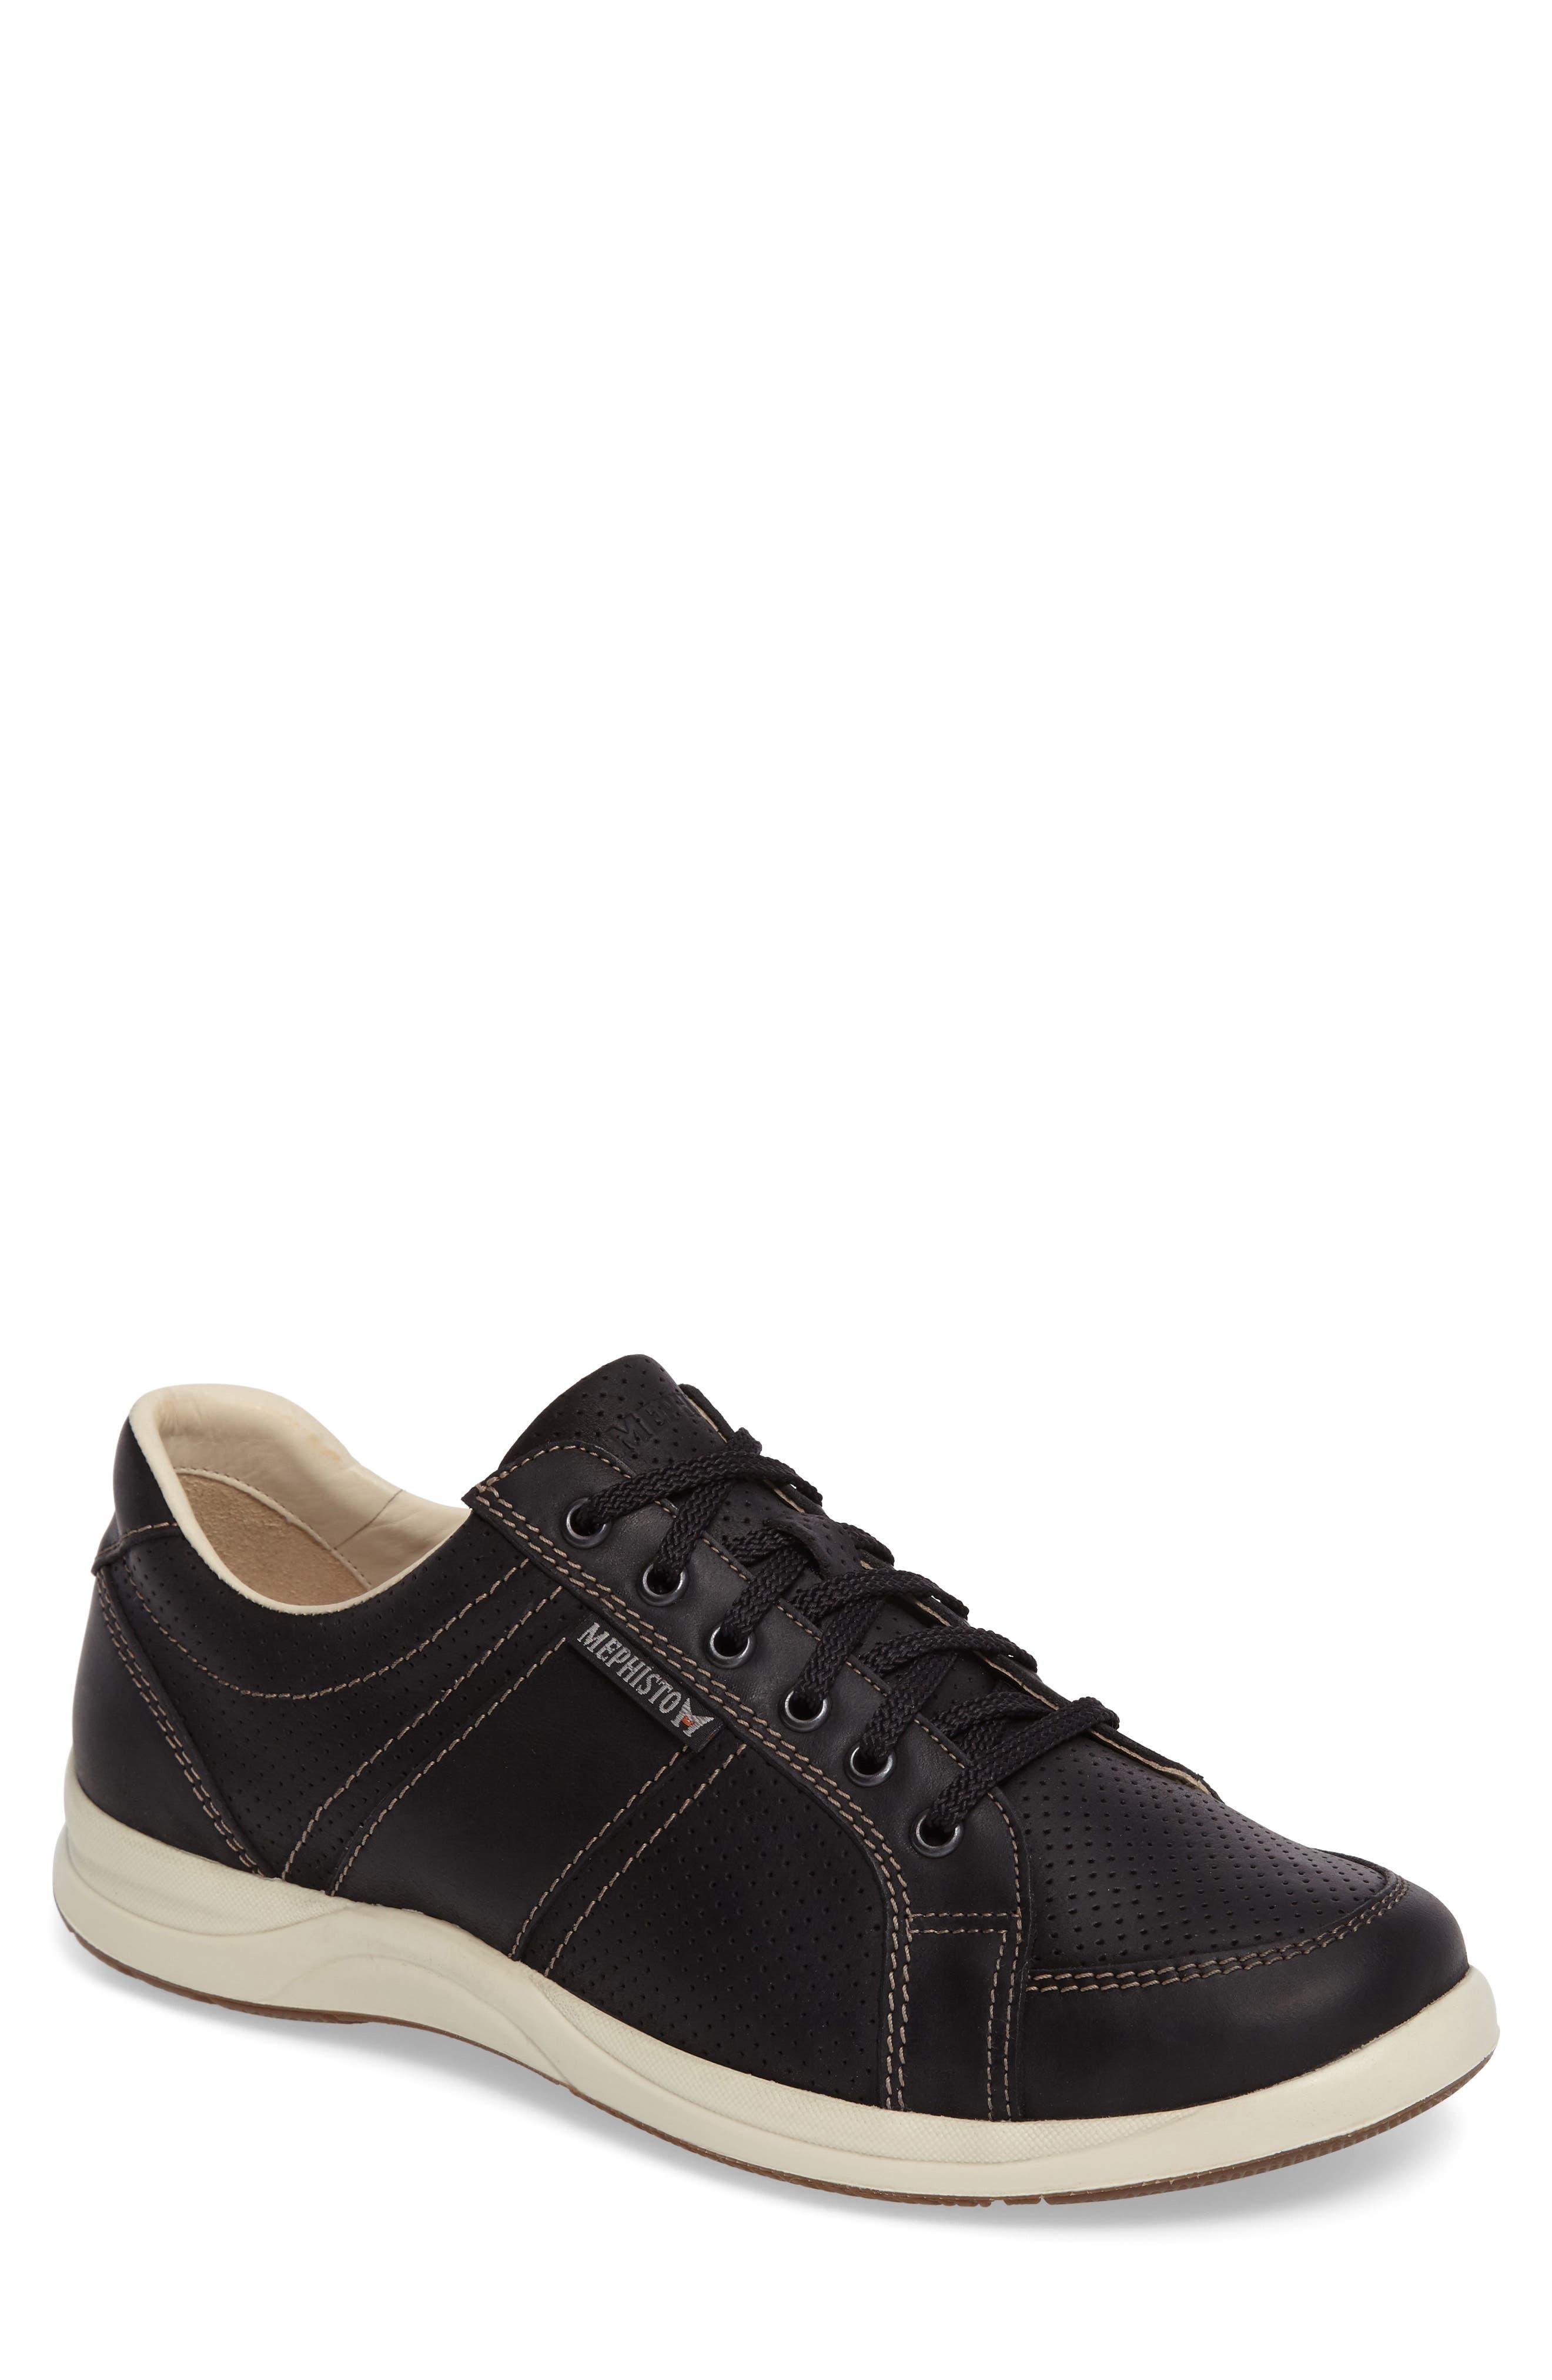 'Hero' Perforated Sneaker,                         Main,                         color, Black Nubuck Leather